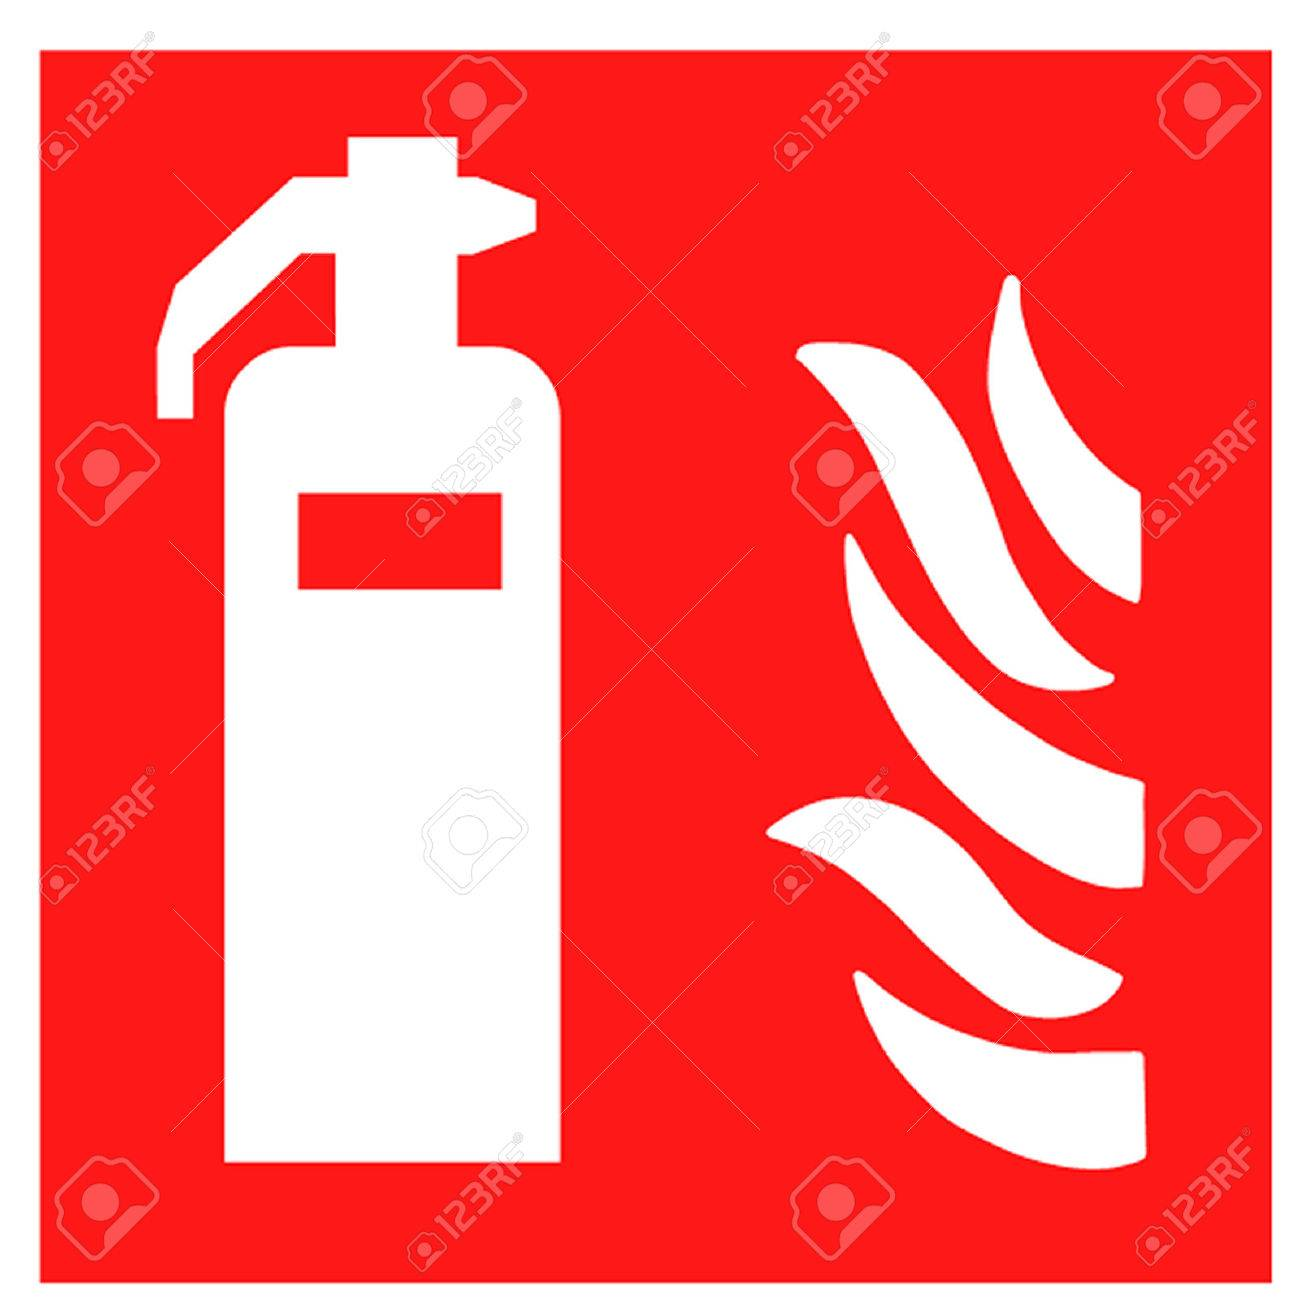 Fire extinguisher symbol royalty free cliparts vectors and stock fire extinguisher symbol stock vector 27378028 buycottarizona